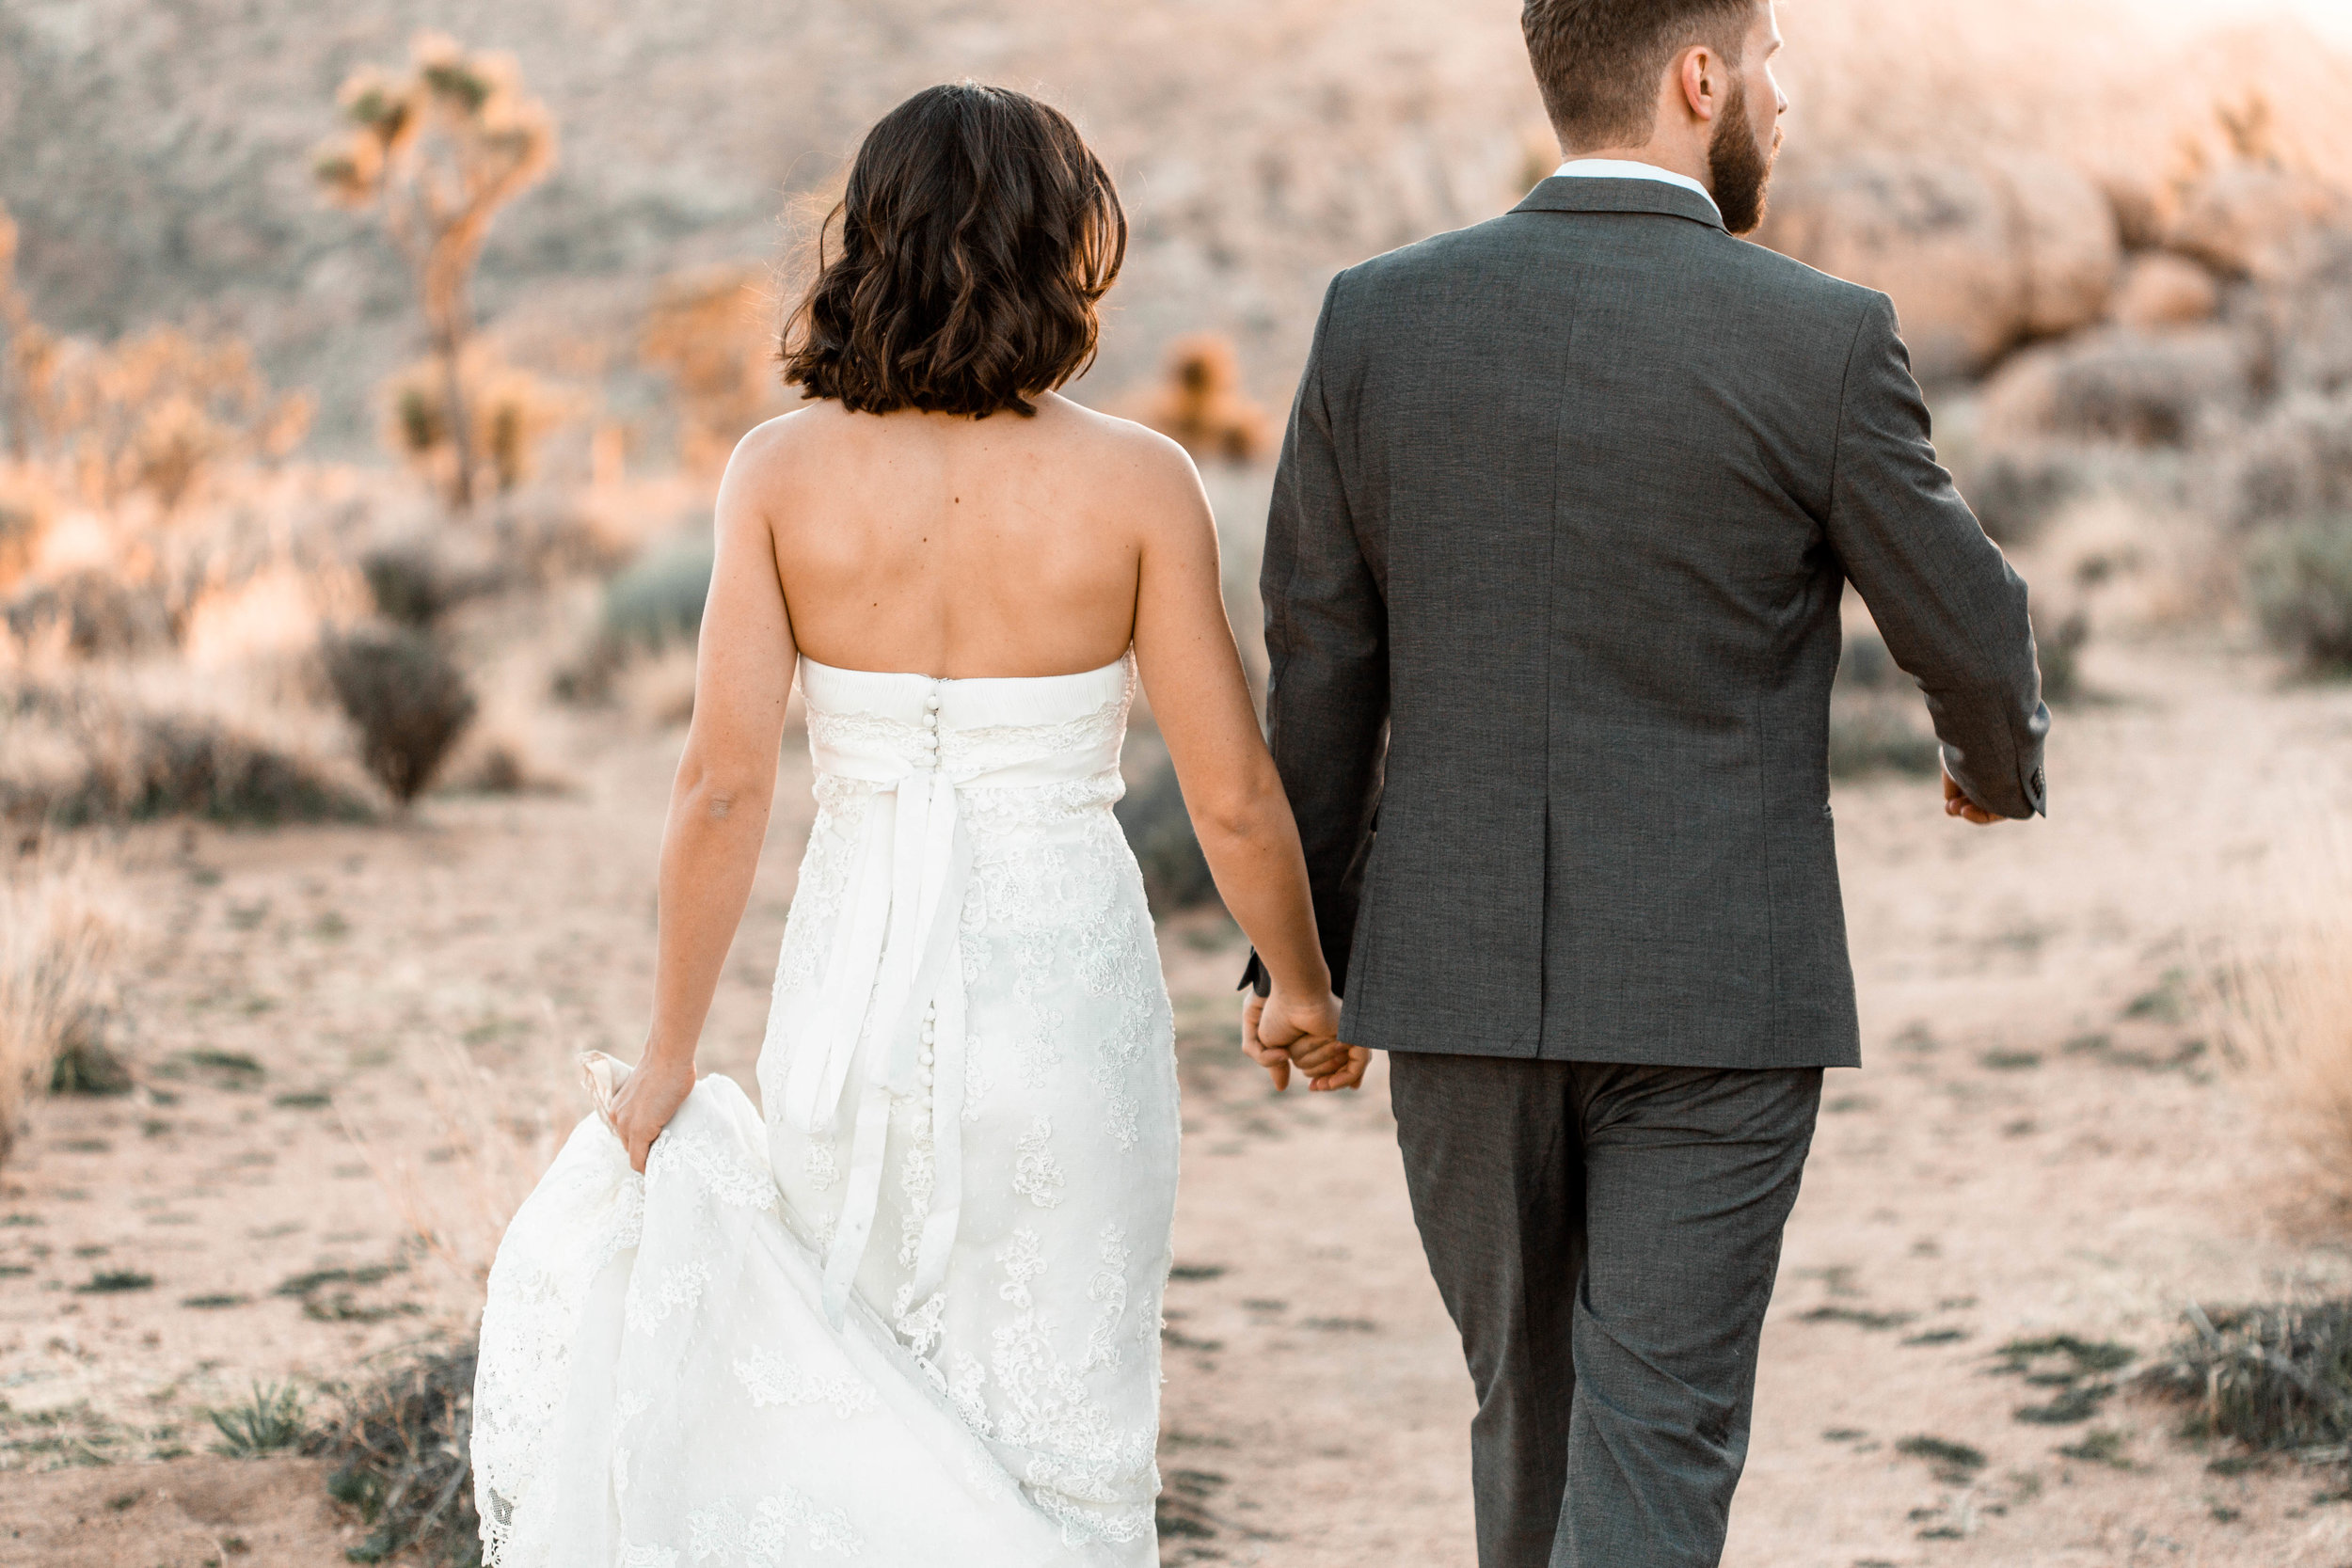 nicole-daacke-photography-joshua-tree-adventurous-elopement-wedding-national-park-wedding-photographer-adventure-wedding-adventurous-elopement-jtree-joshua-tree-national-park-wedding-photographer-intimate-weddings-golden-desert-love-22.jpg